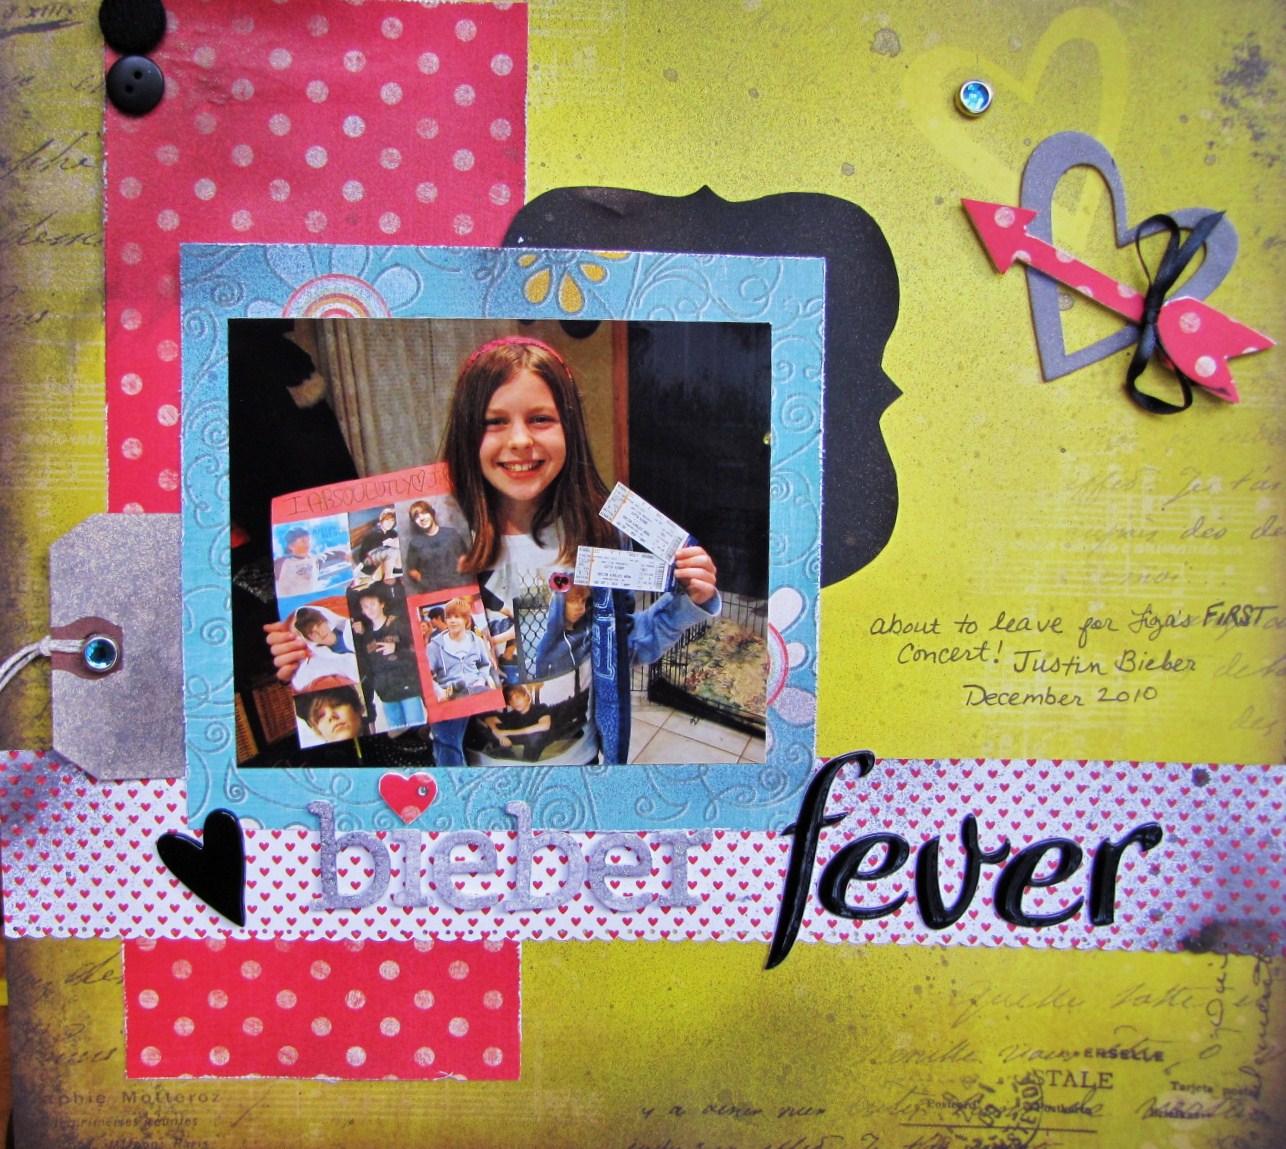 Justin bieber scrapbook ideas - Justin Bieber Fever